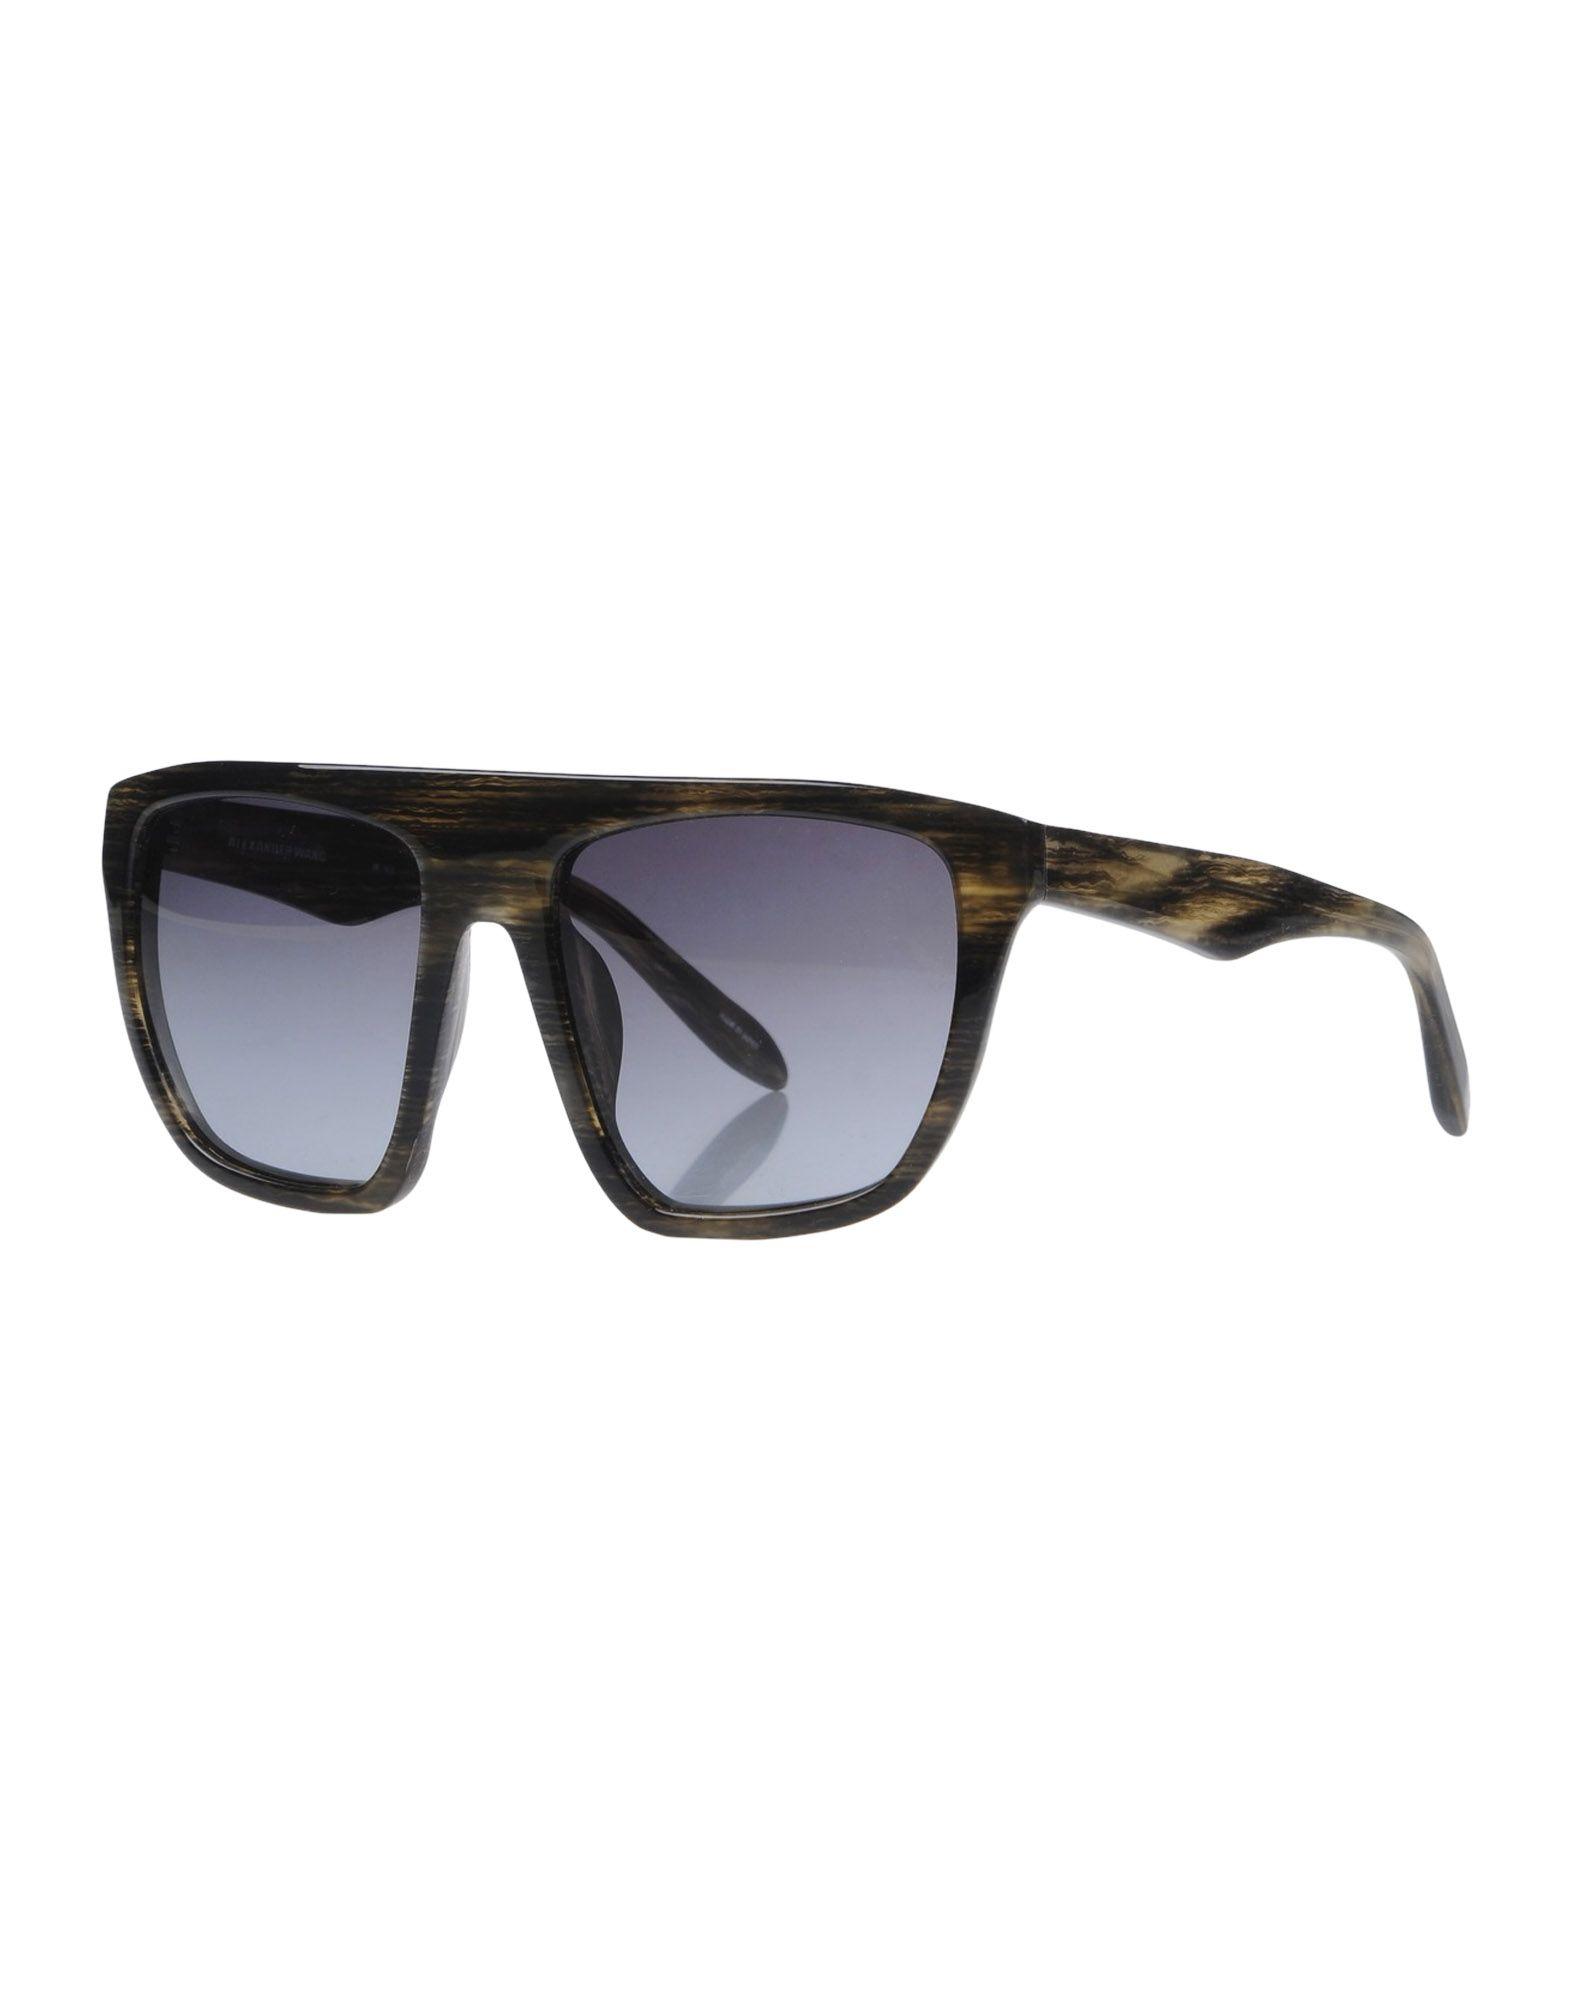 ALEXANDER WANG BY LINDA FARROW Солнечные очки